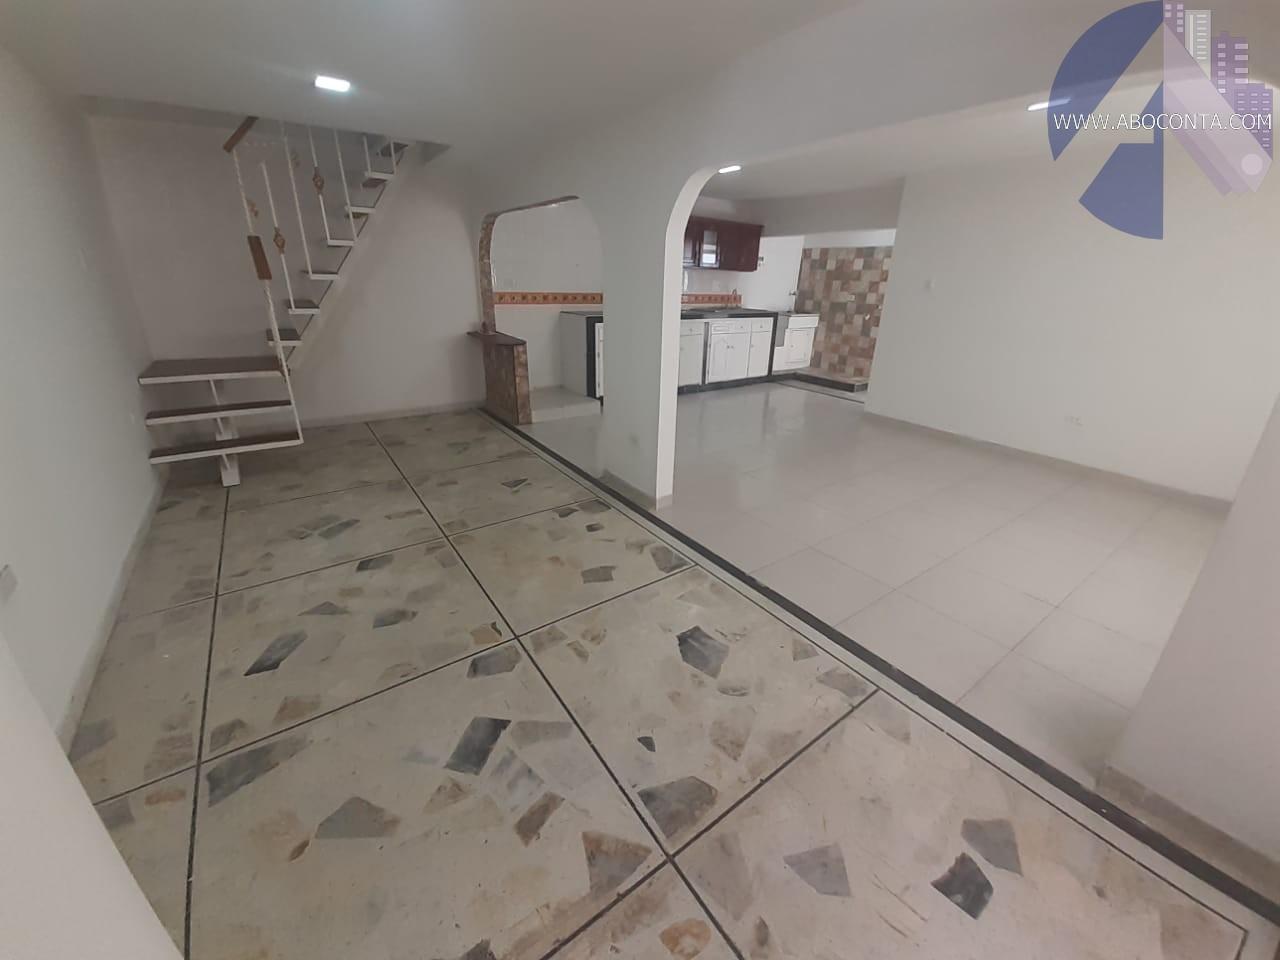 Apartamento Dúplex en Pie de la Popa